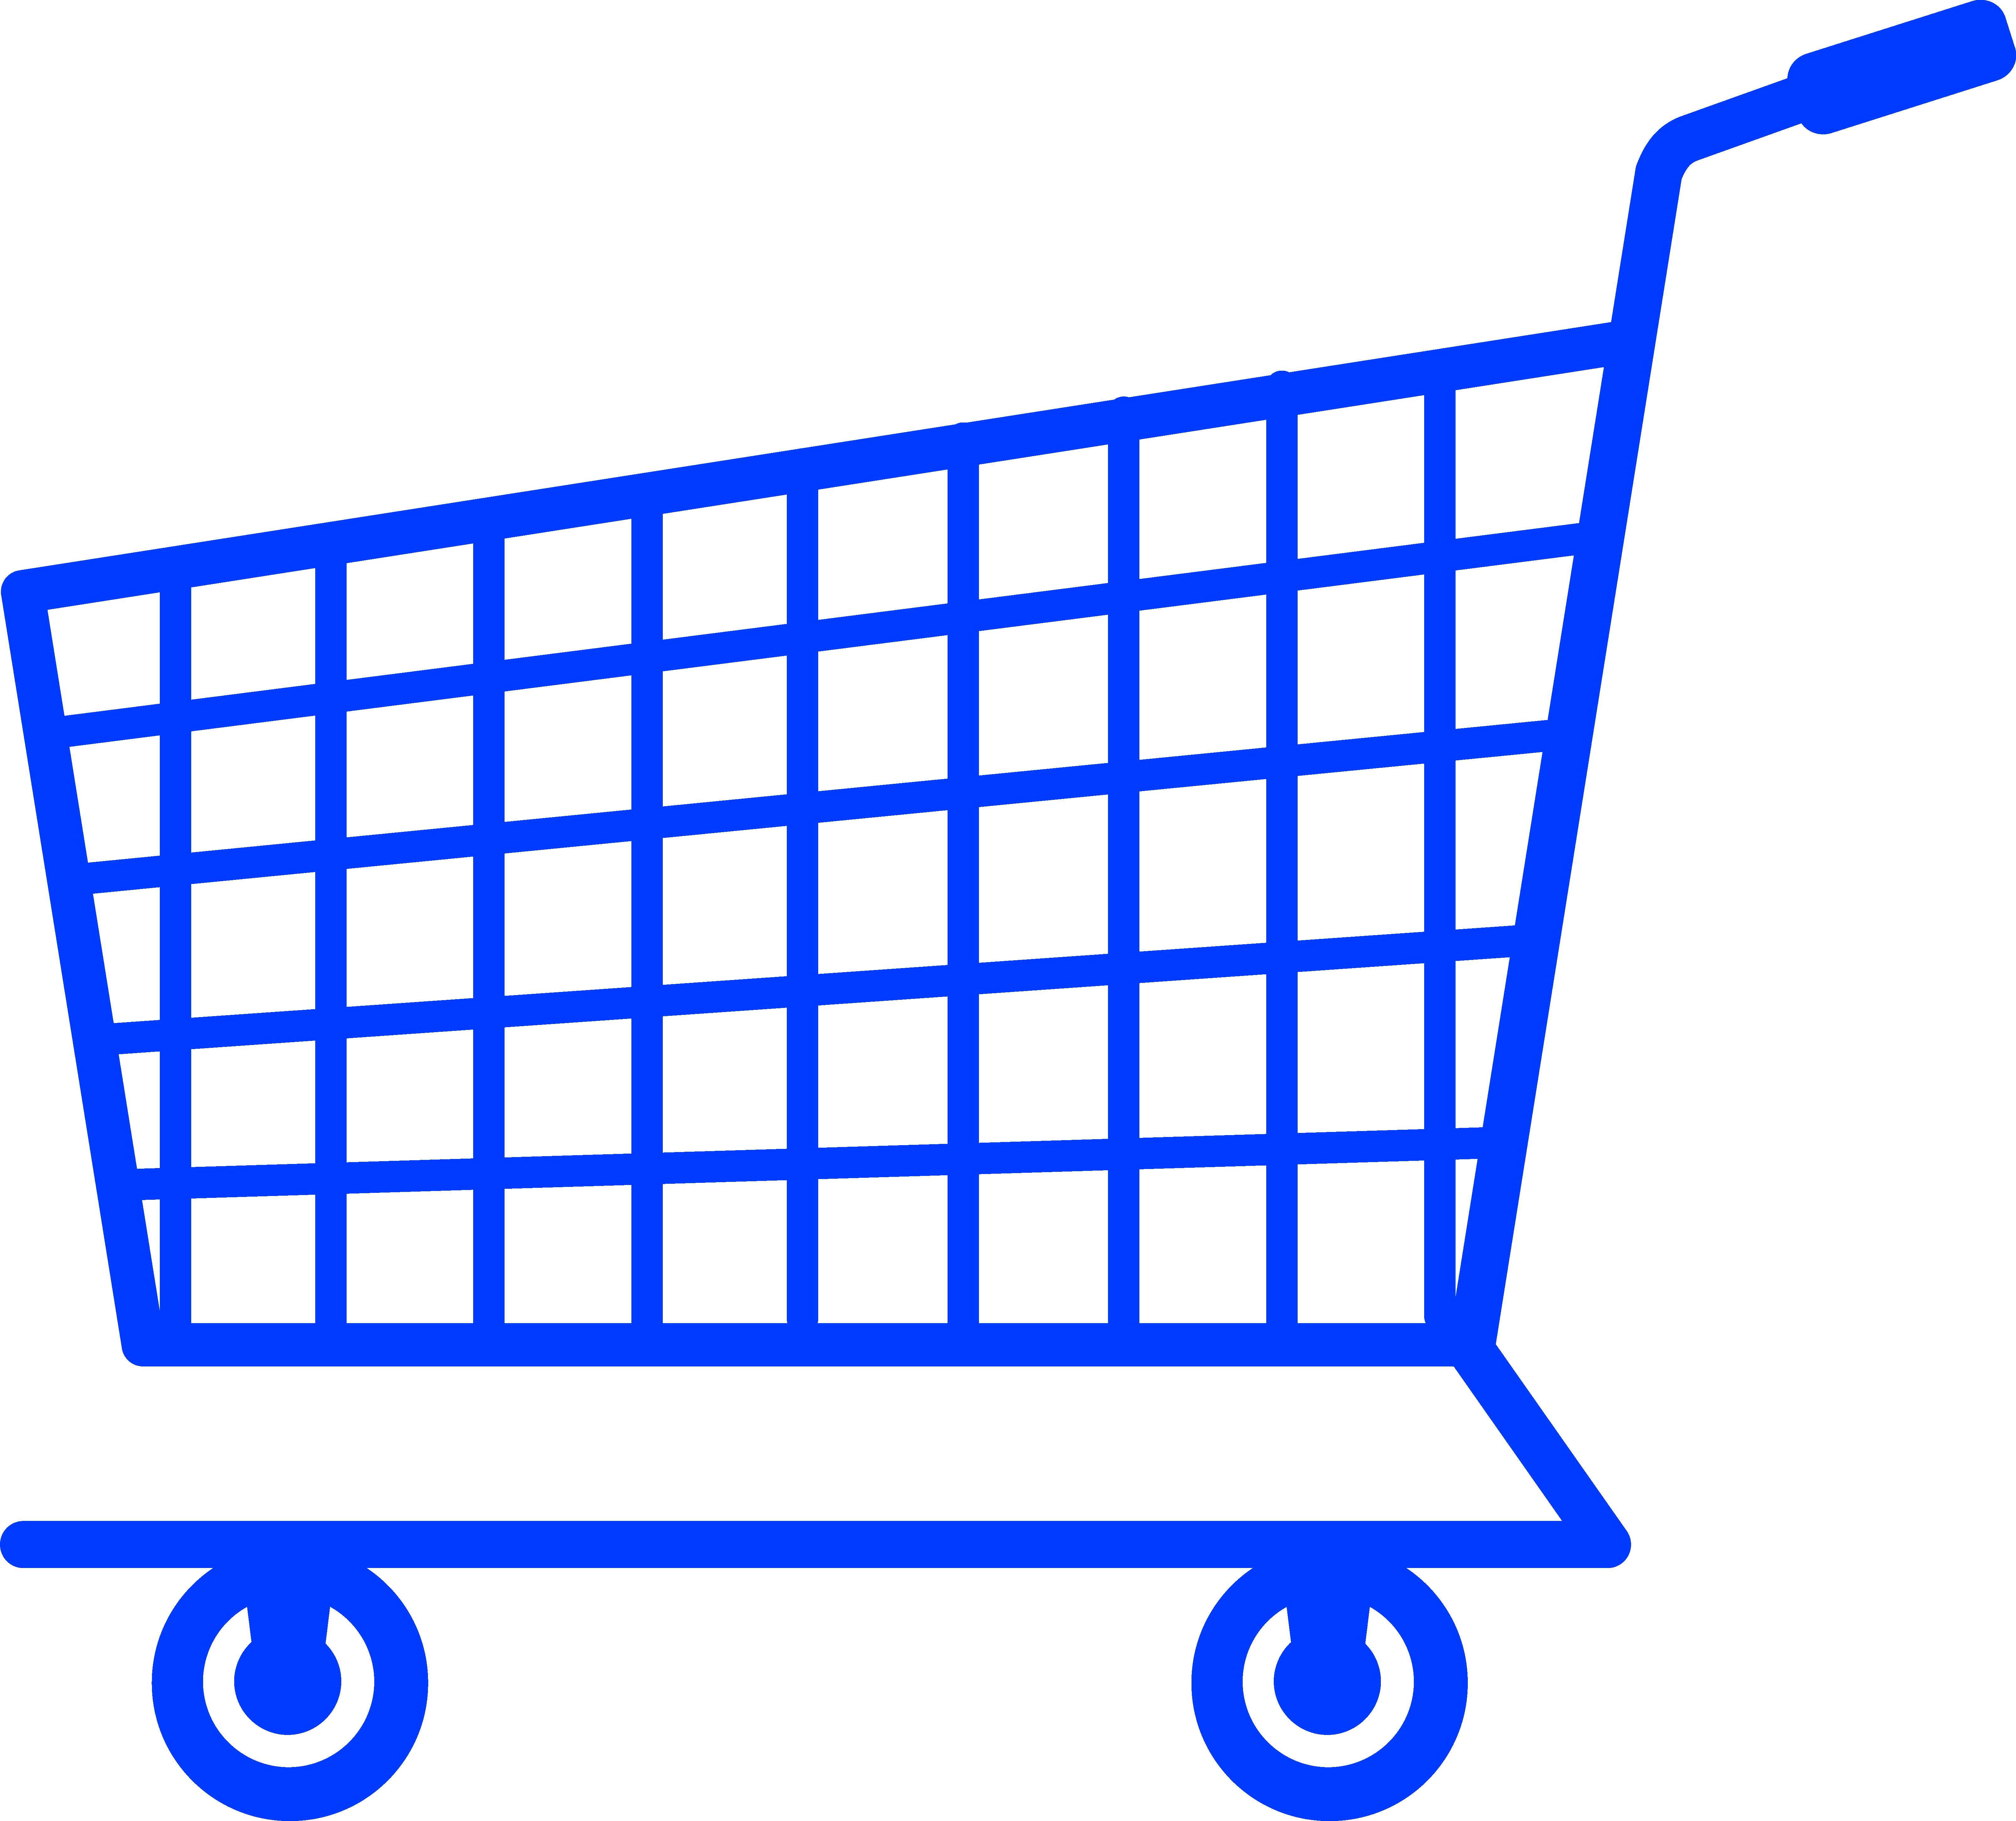 Shop clipart consumer Clipart Supermarket Free Clipart buy%20clipart